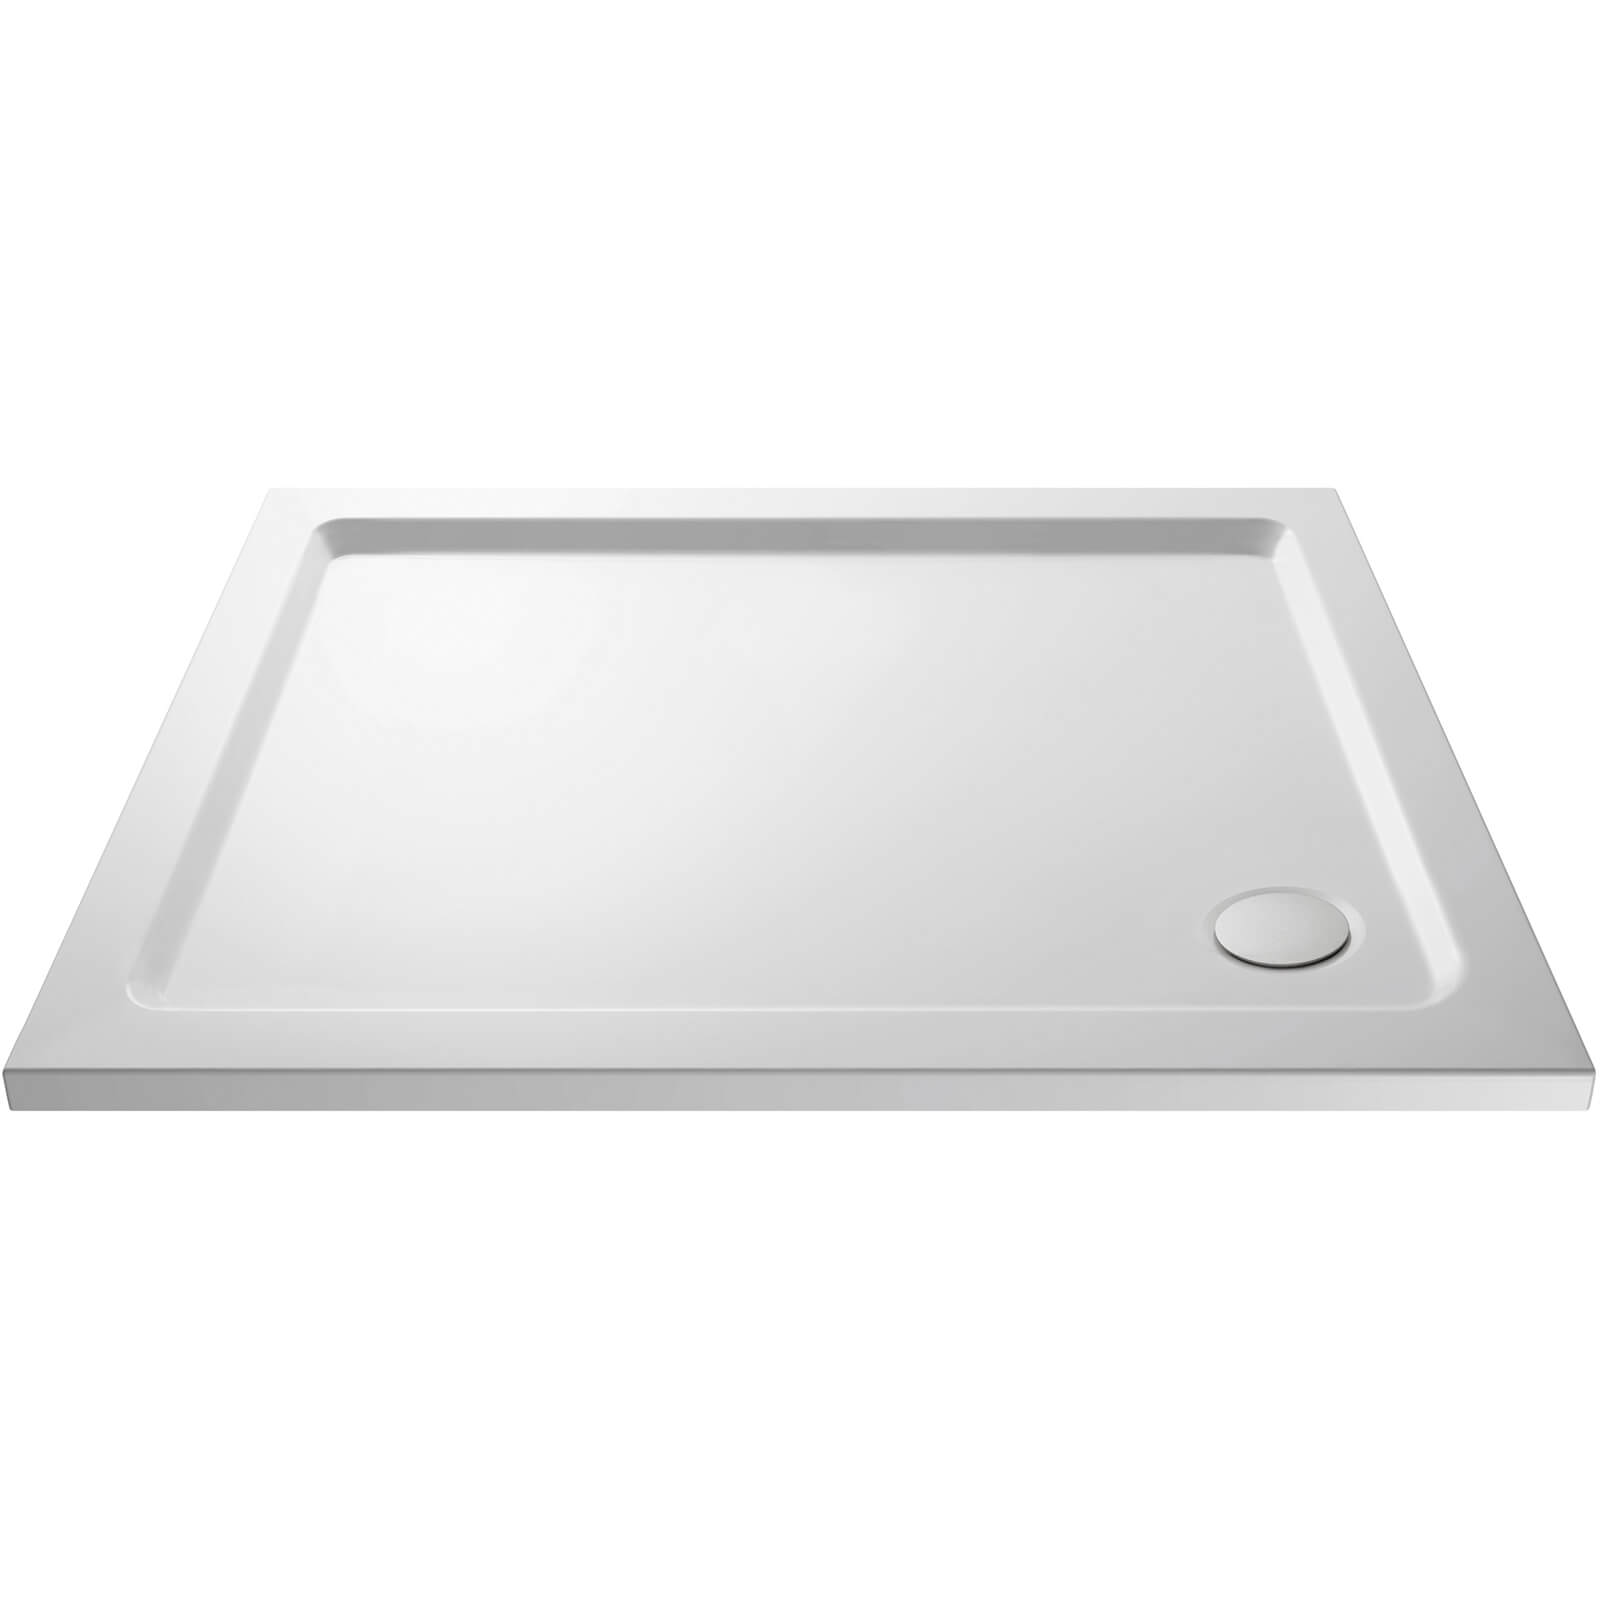 Balterley Rectangular Shower Tray - 900 x 760mm